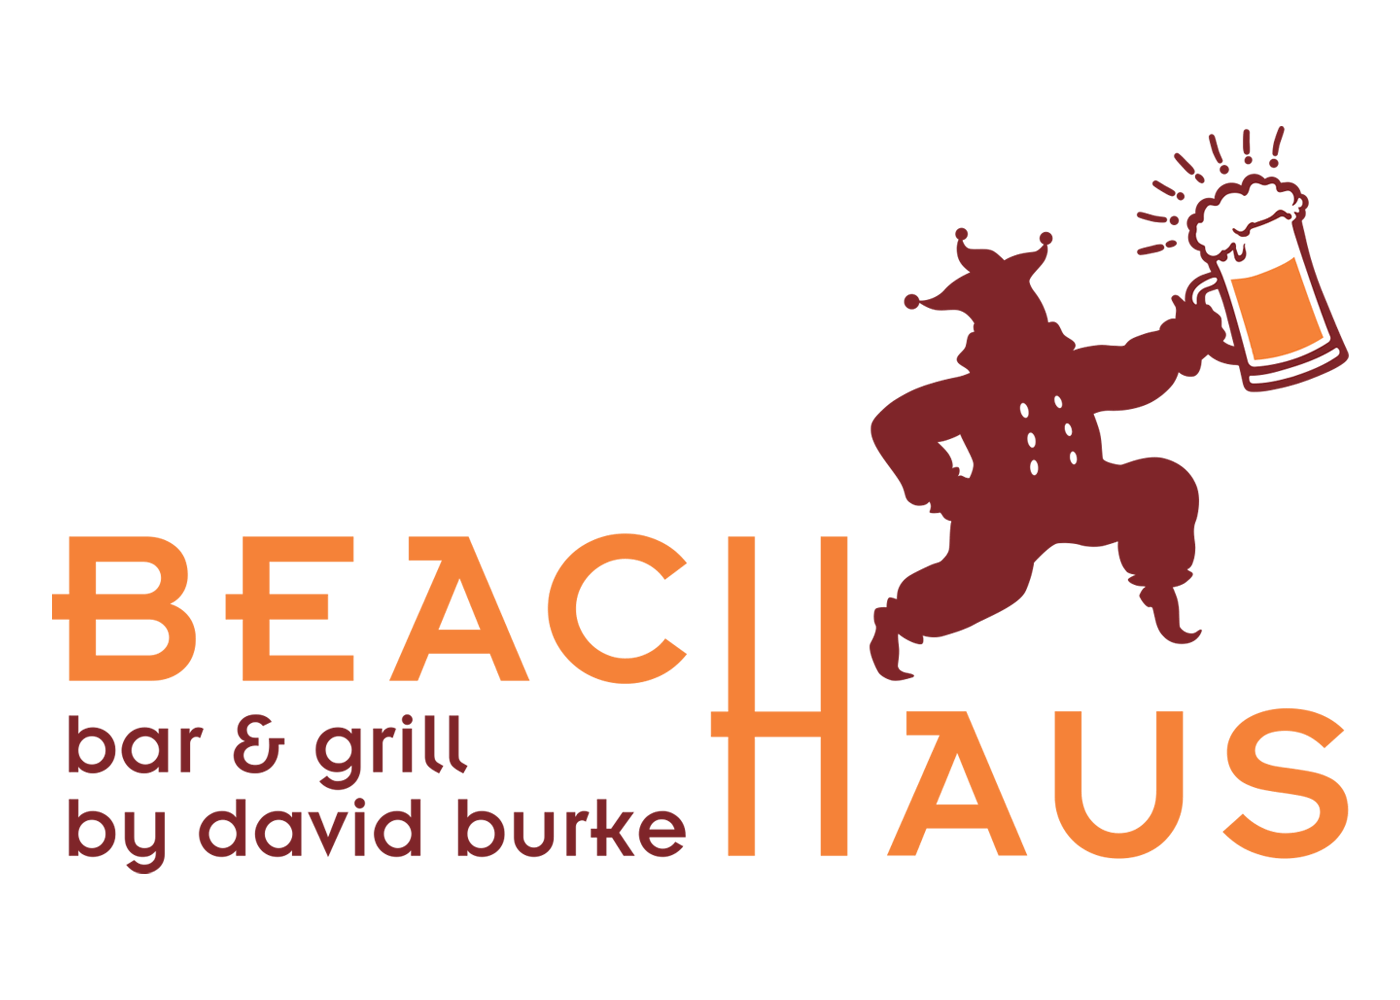 Beach Hause Bar & Grill by David Burke